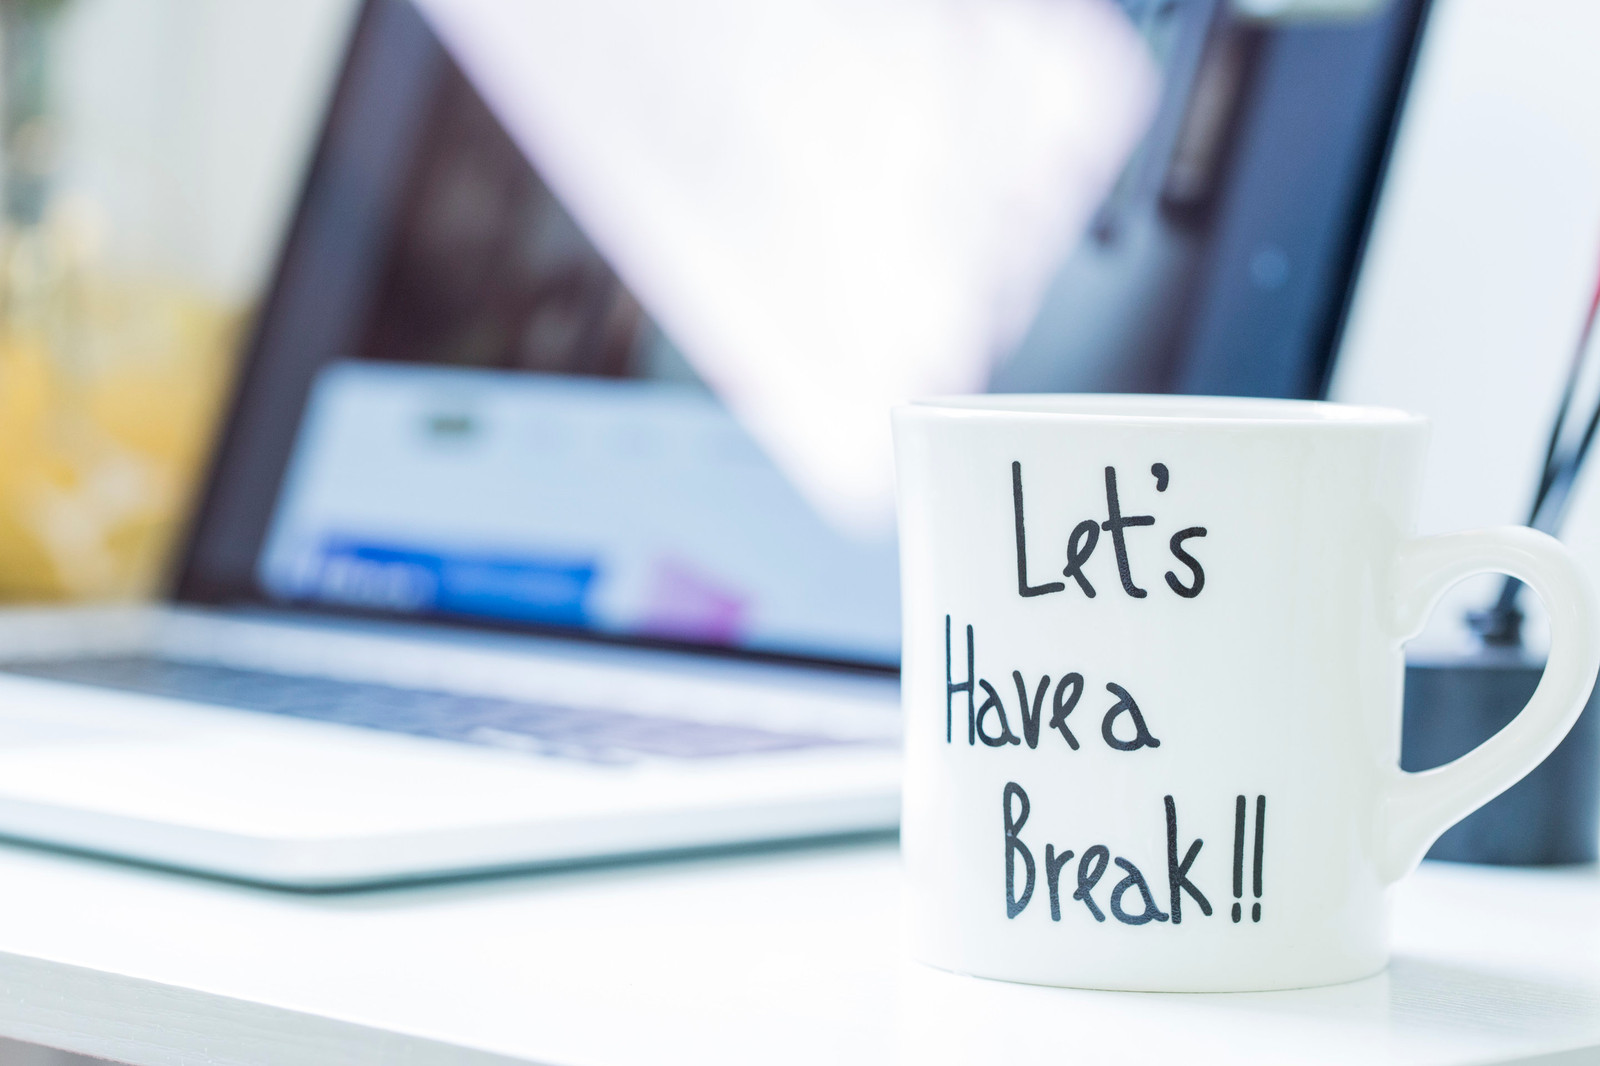 Lets have a break